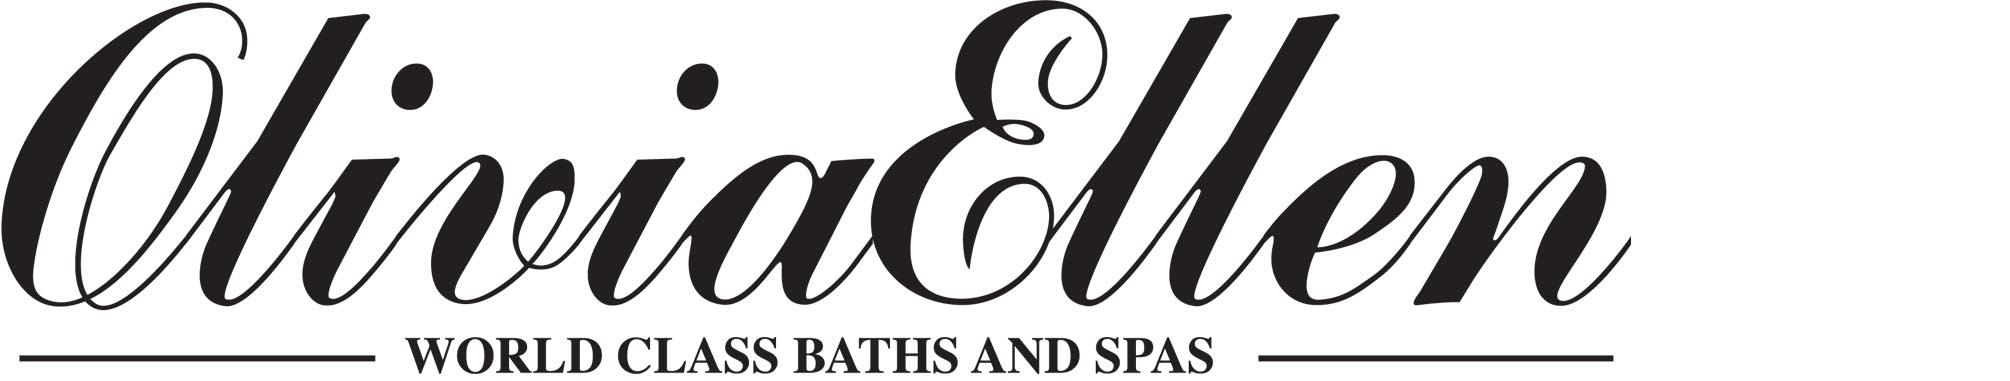 olivia-ellen-logo-banner.jpg